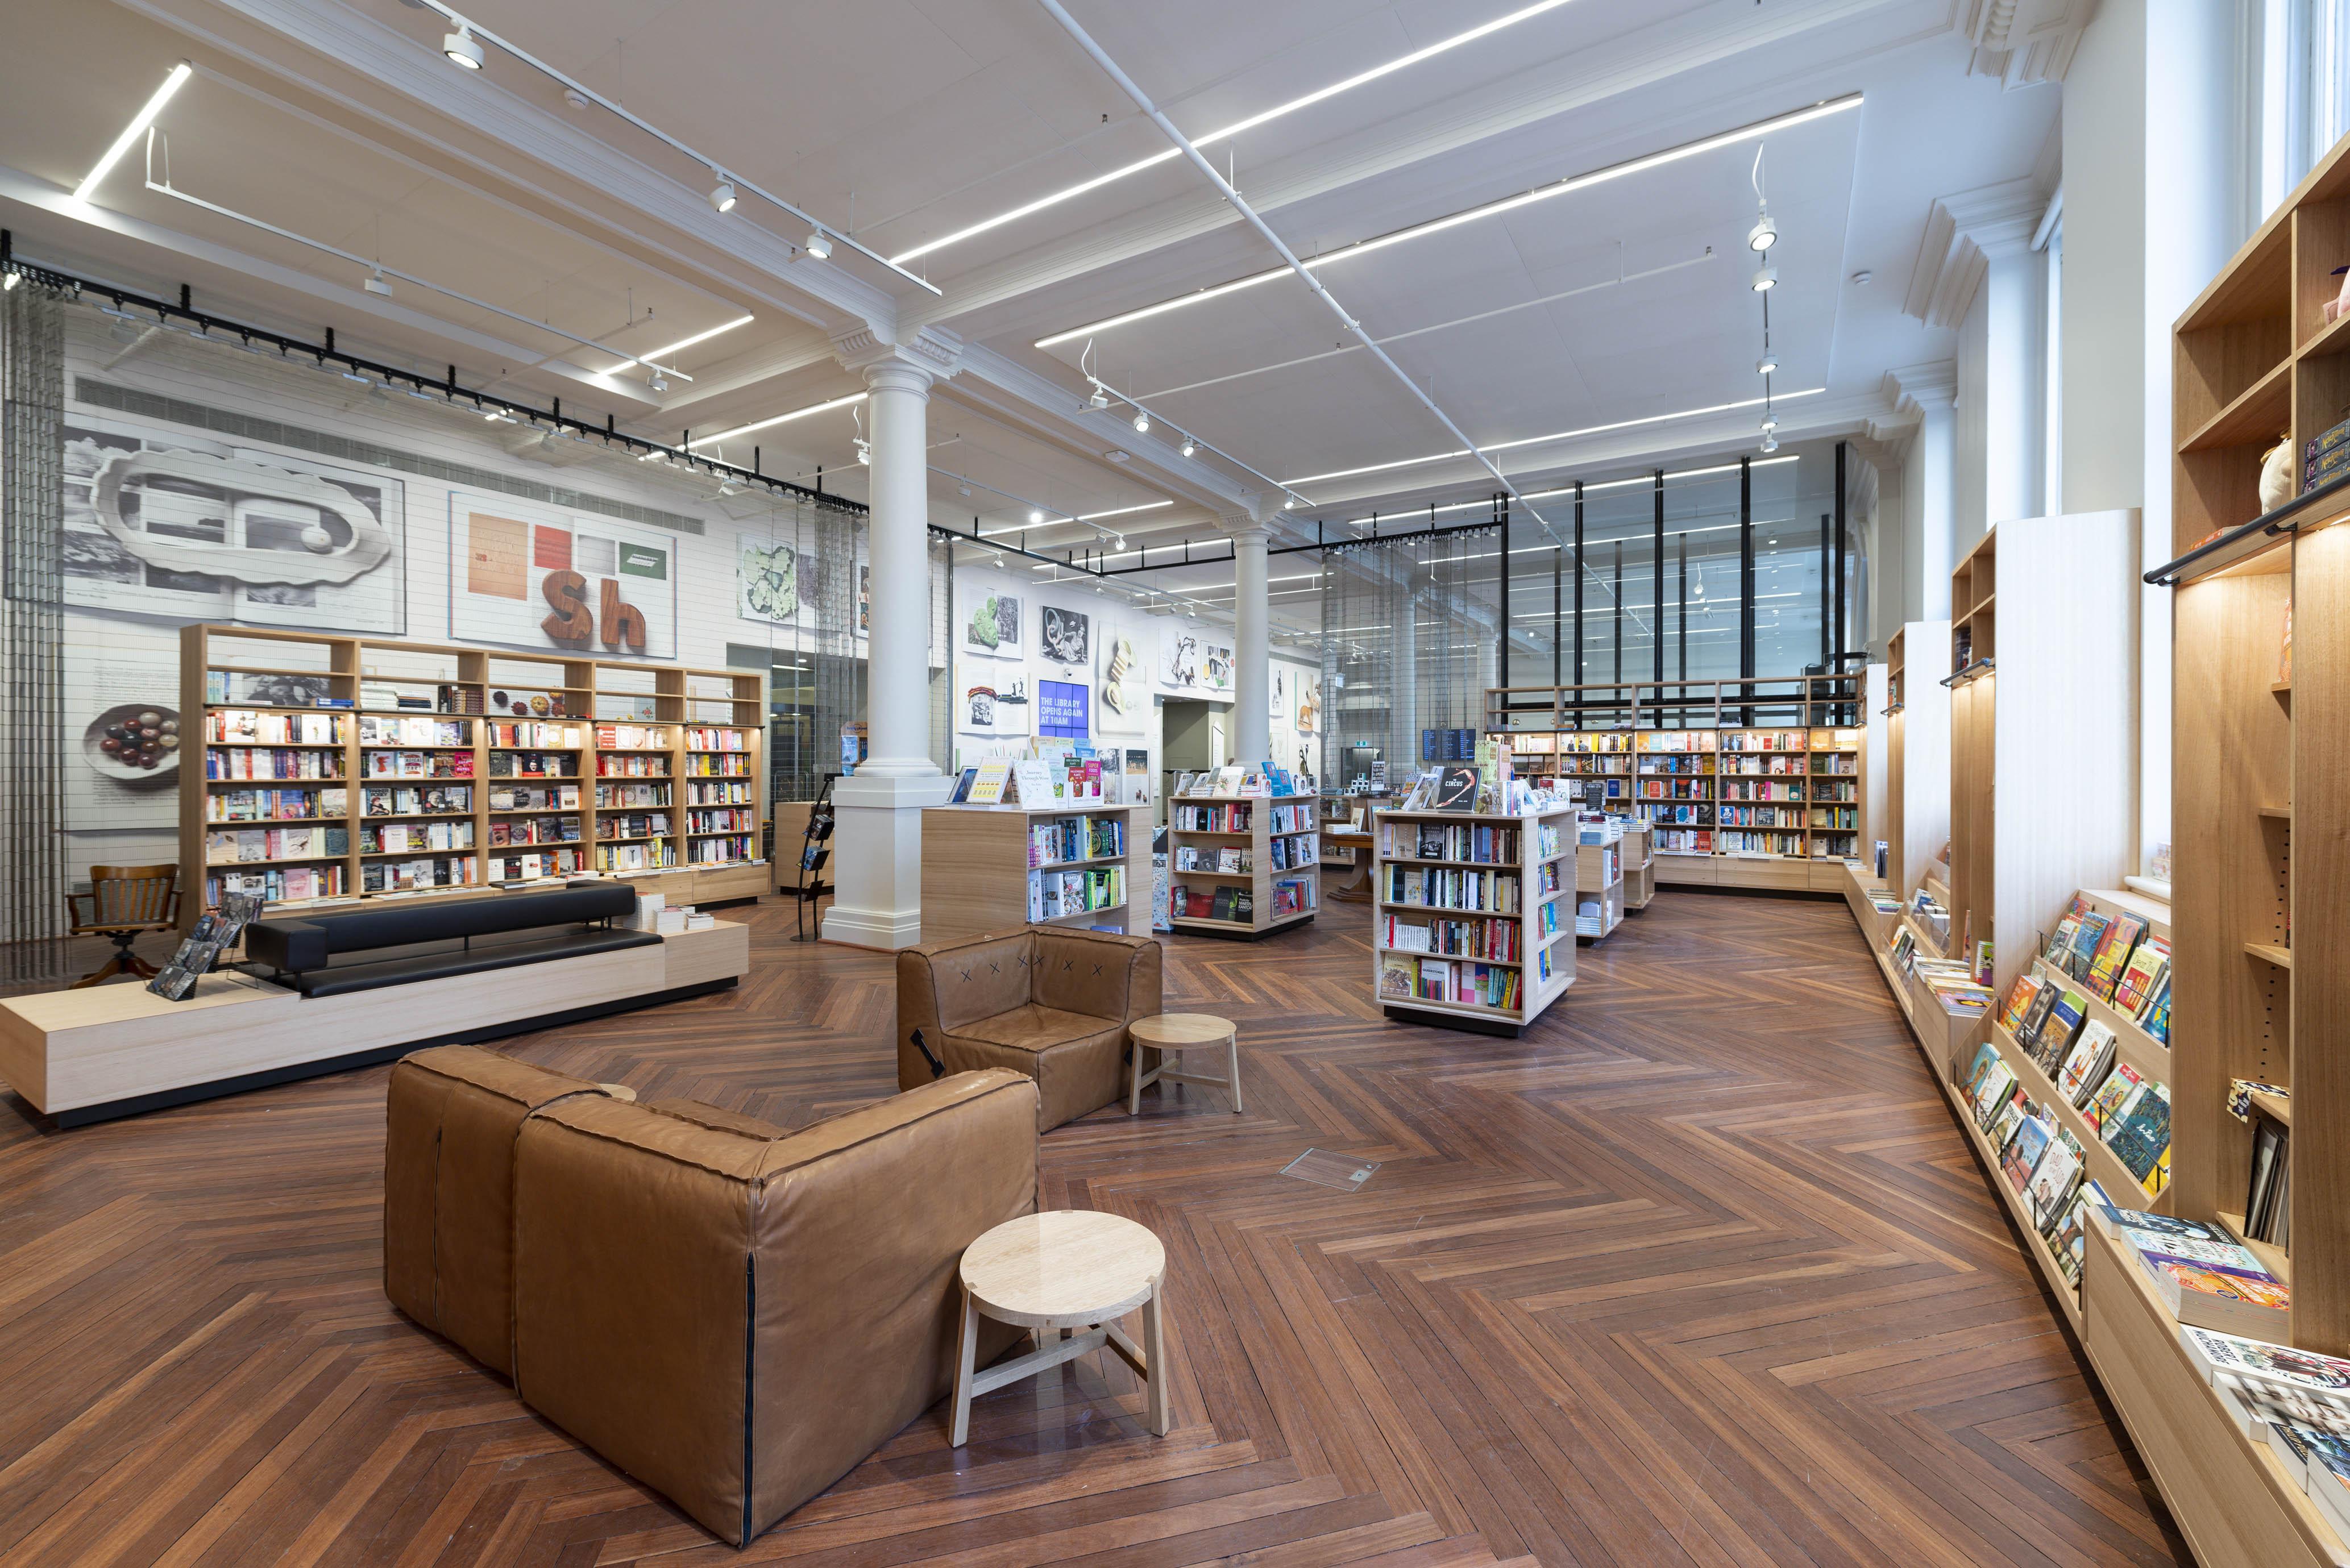 SLV_Readings bookshop (1)_Credit Patrick Rodriguez